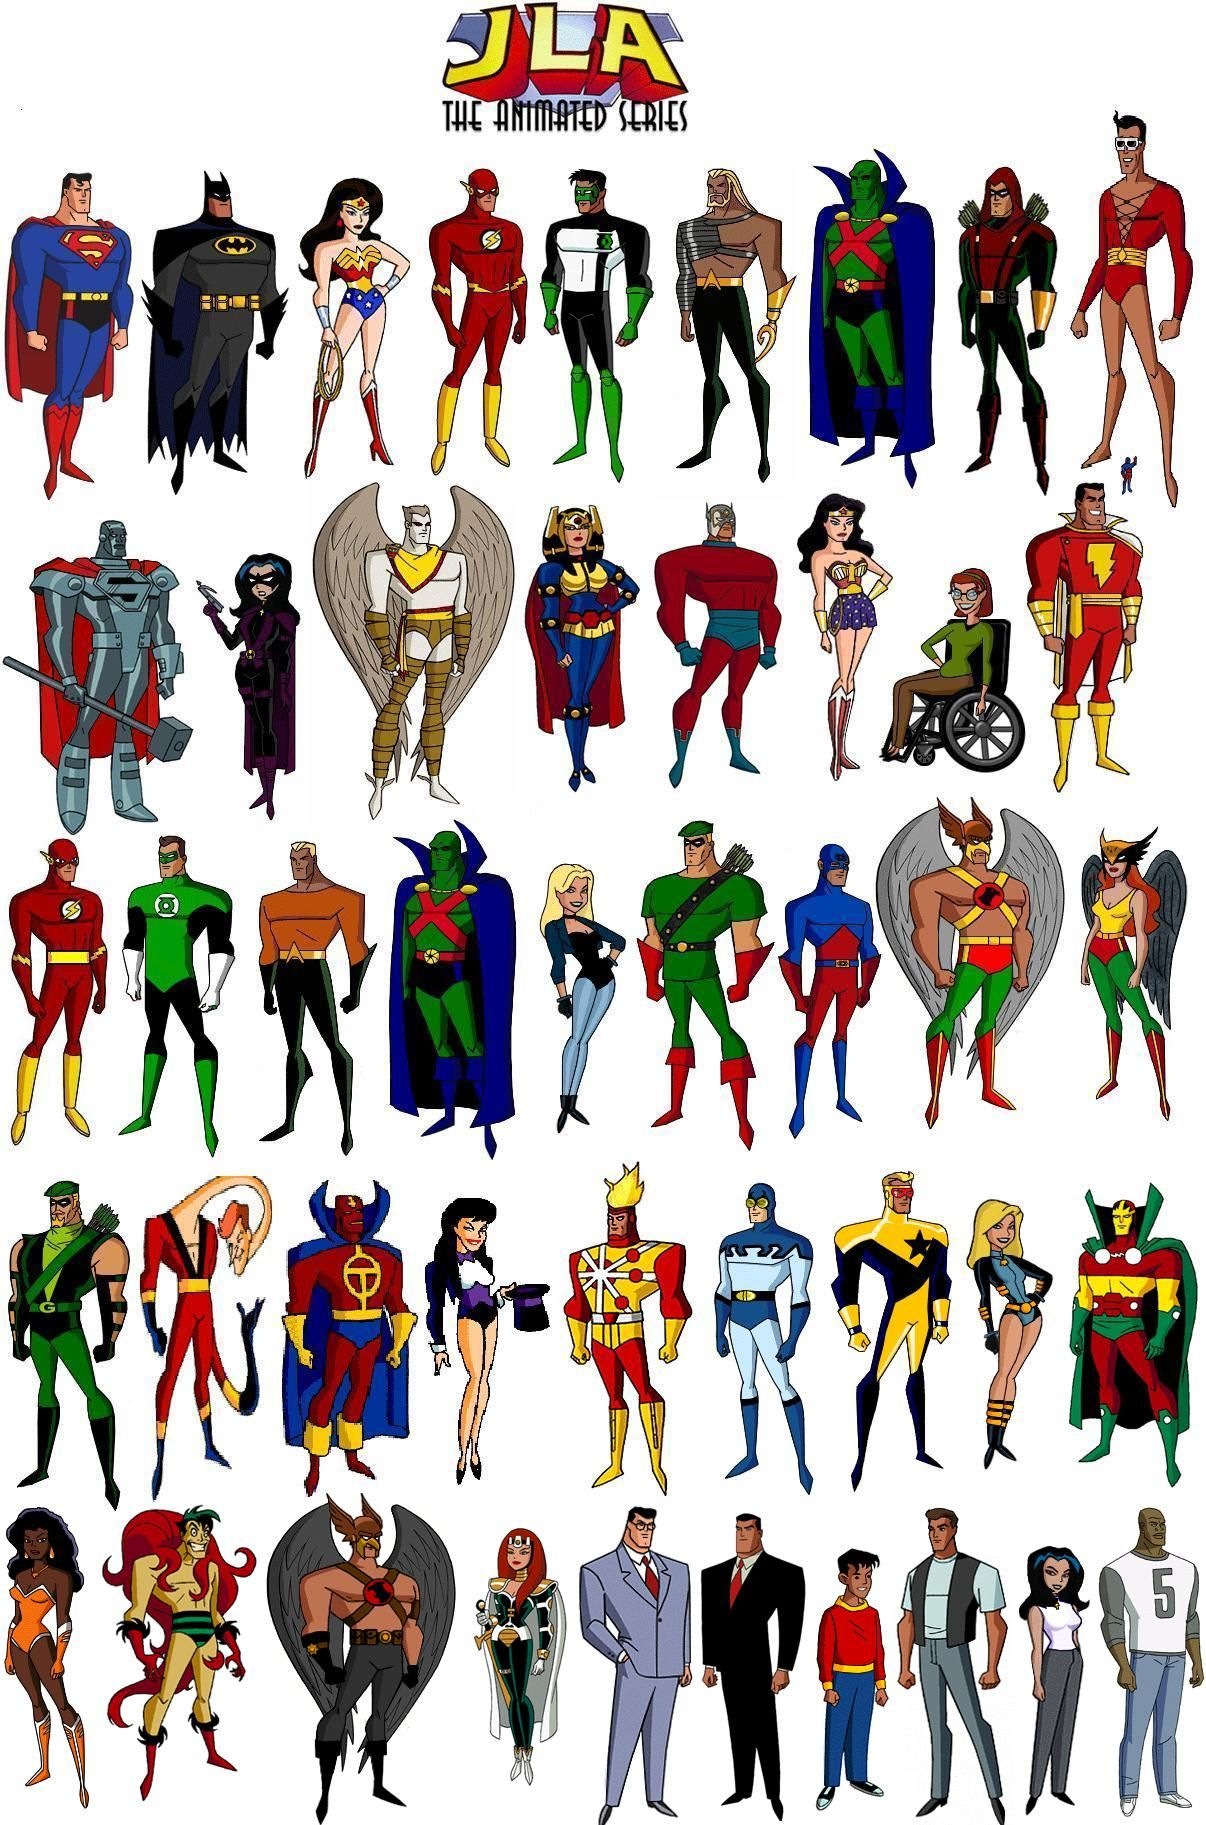 Jlu Animated Dc Comics Superheroes Dc Comics Art Comics